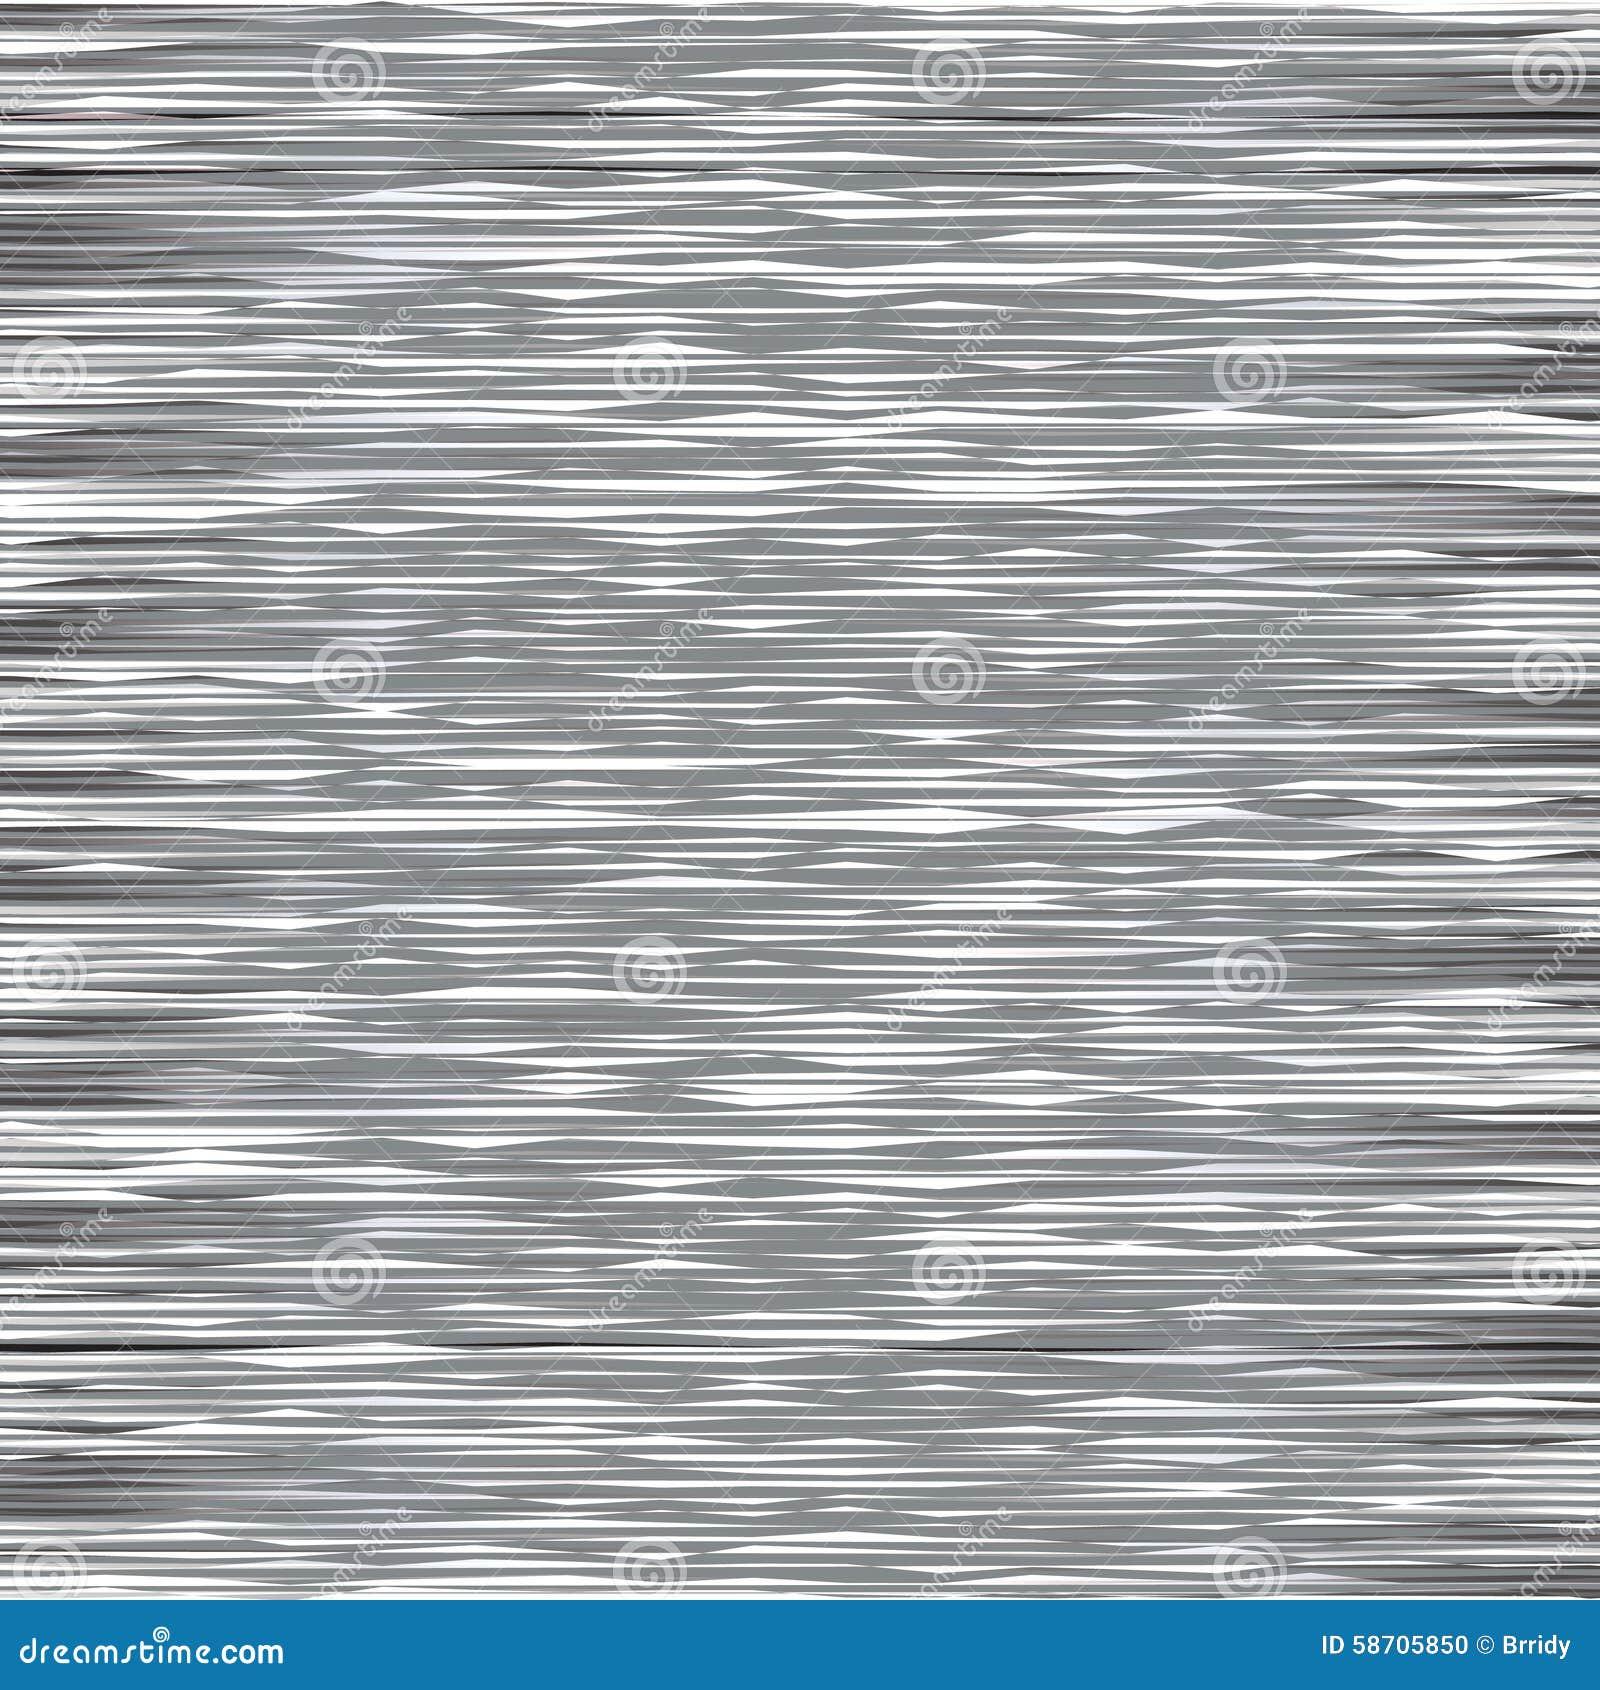 Glitch on TV Screen